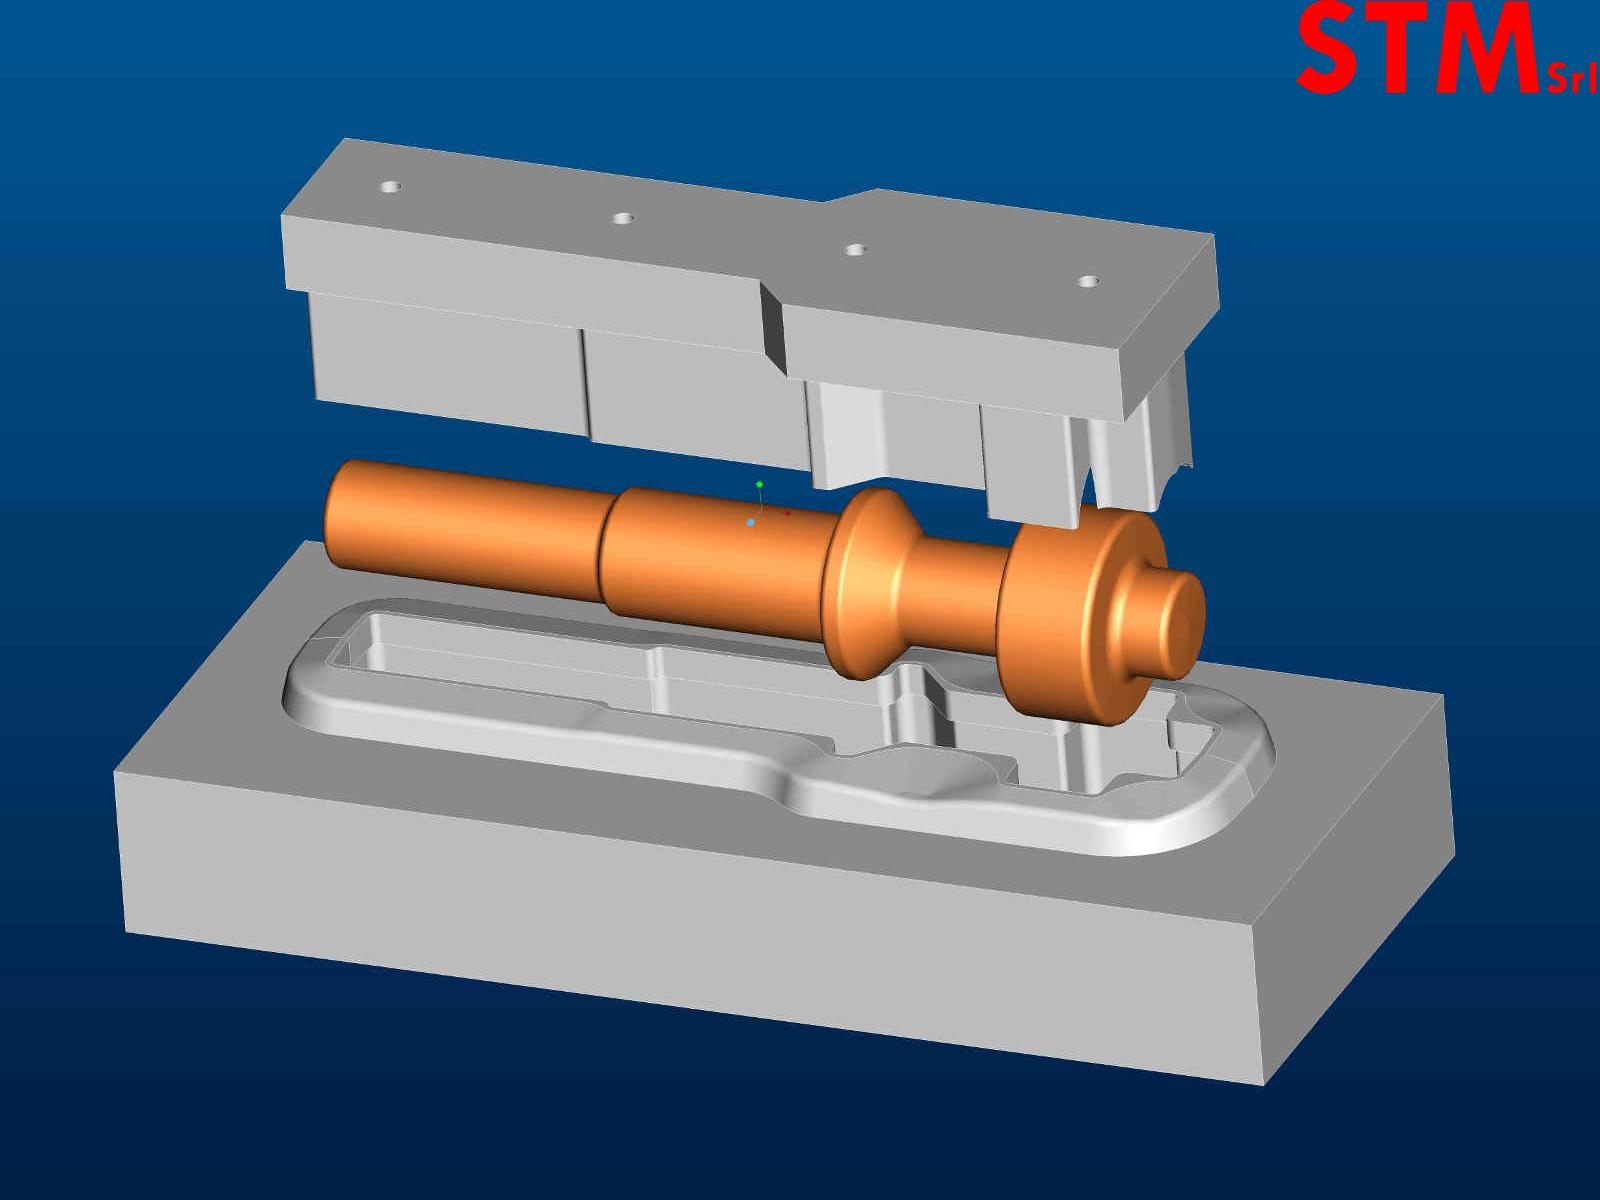 Stampo di tranciatura al CAD/CAM